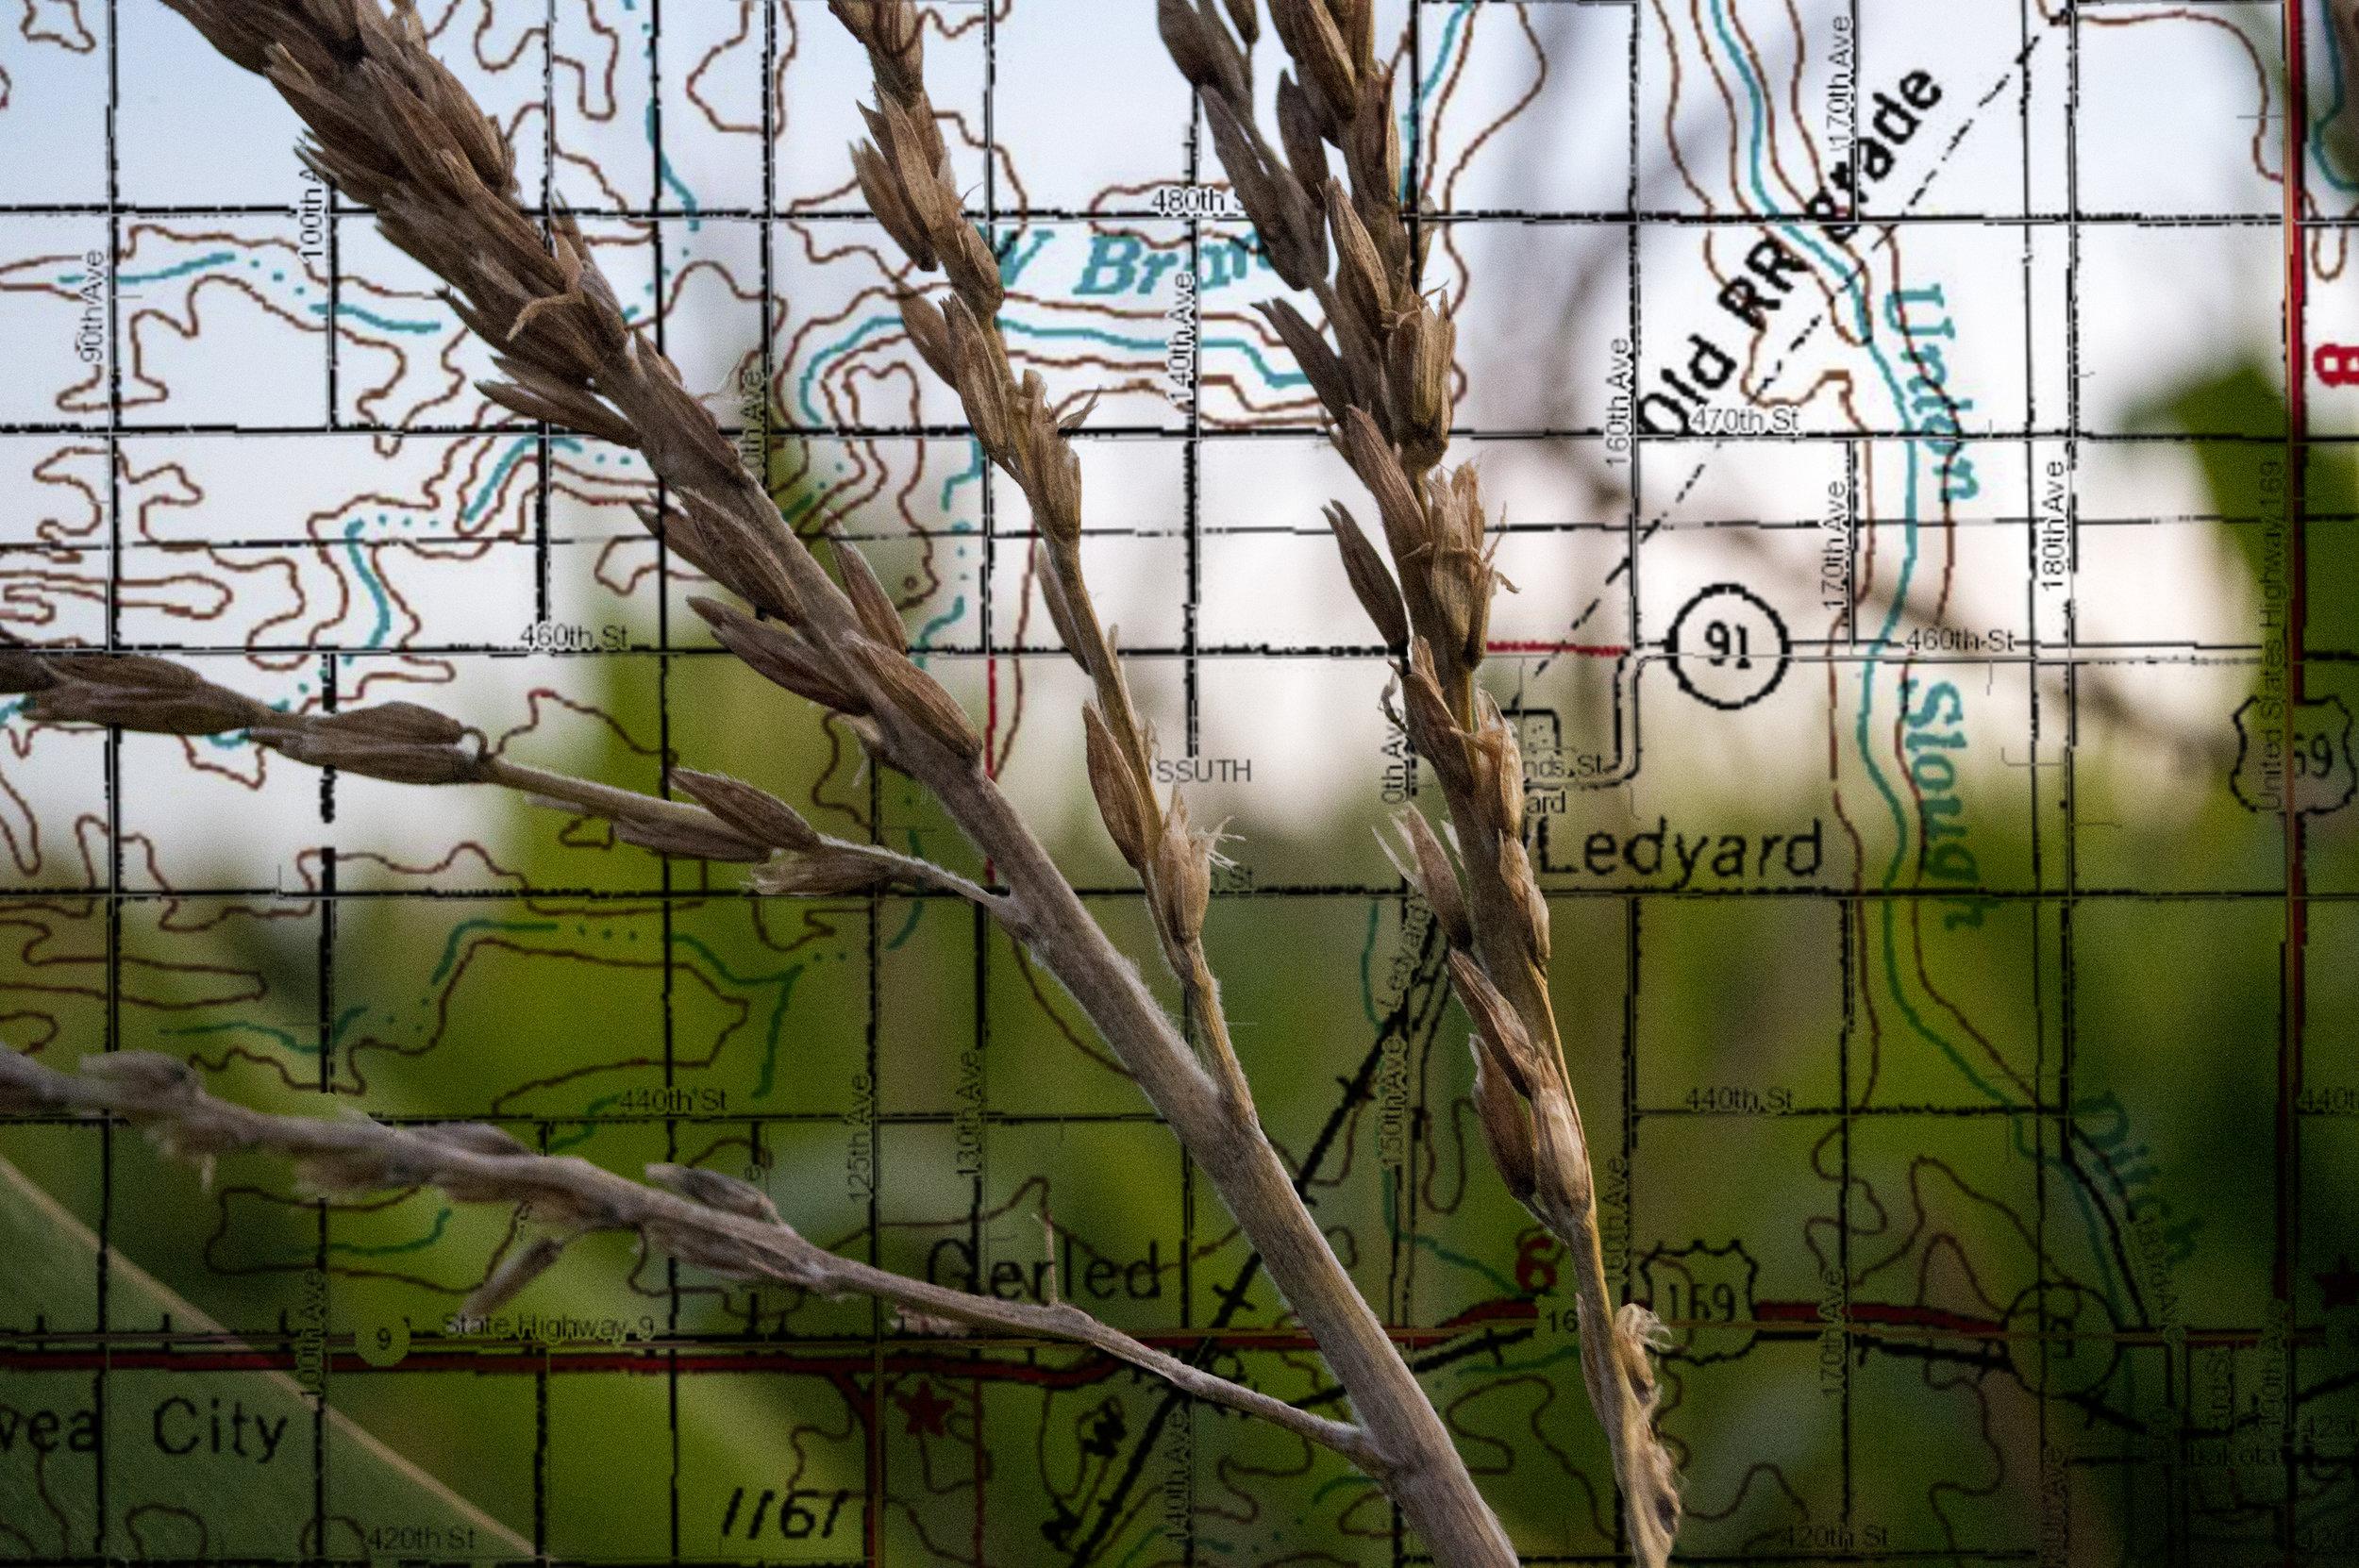 250K-Topographic-Maps_GIS-LedyardTownship_LR.jpg